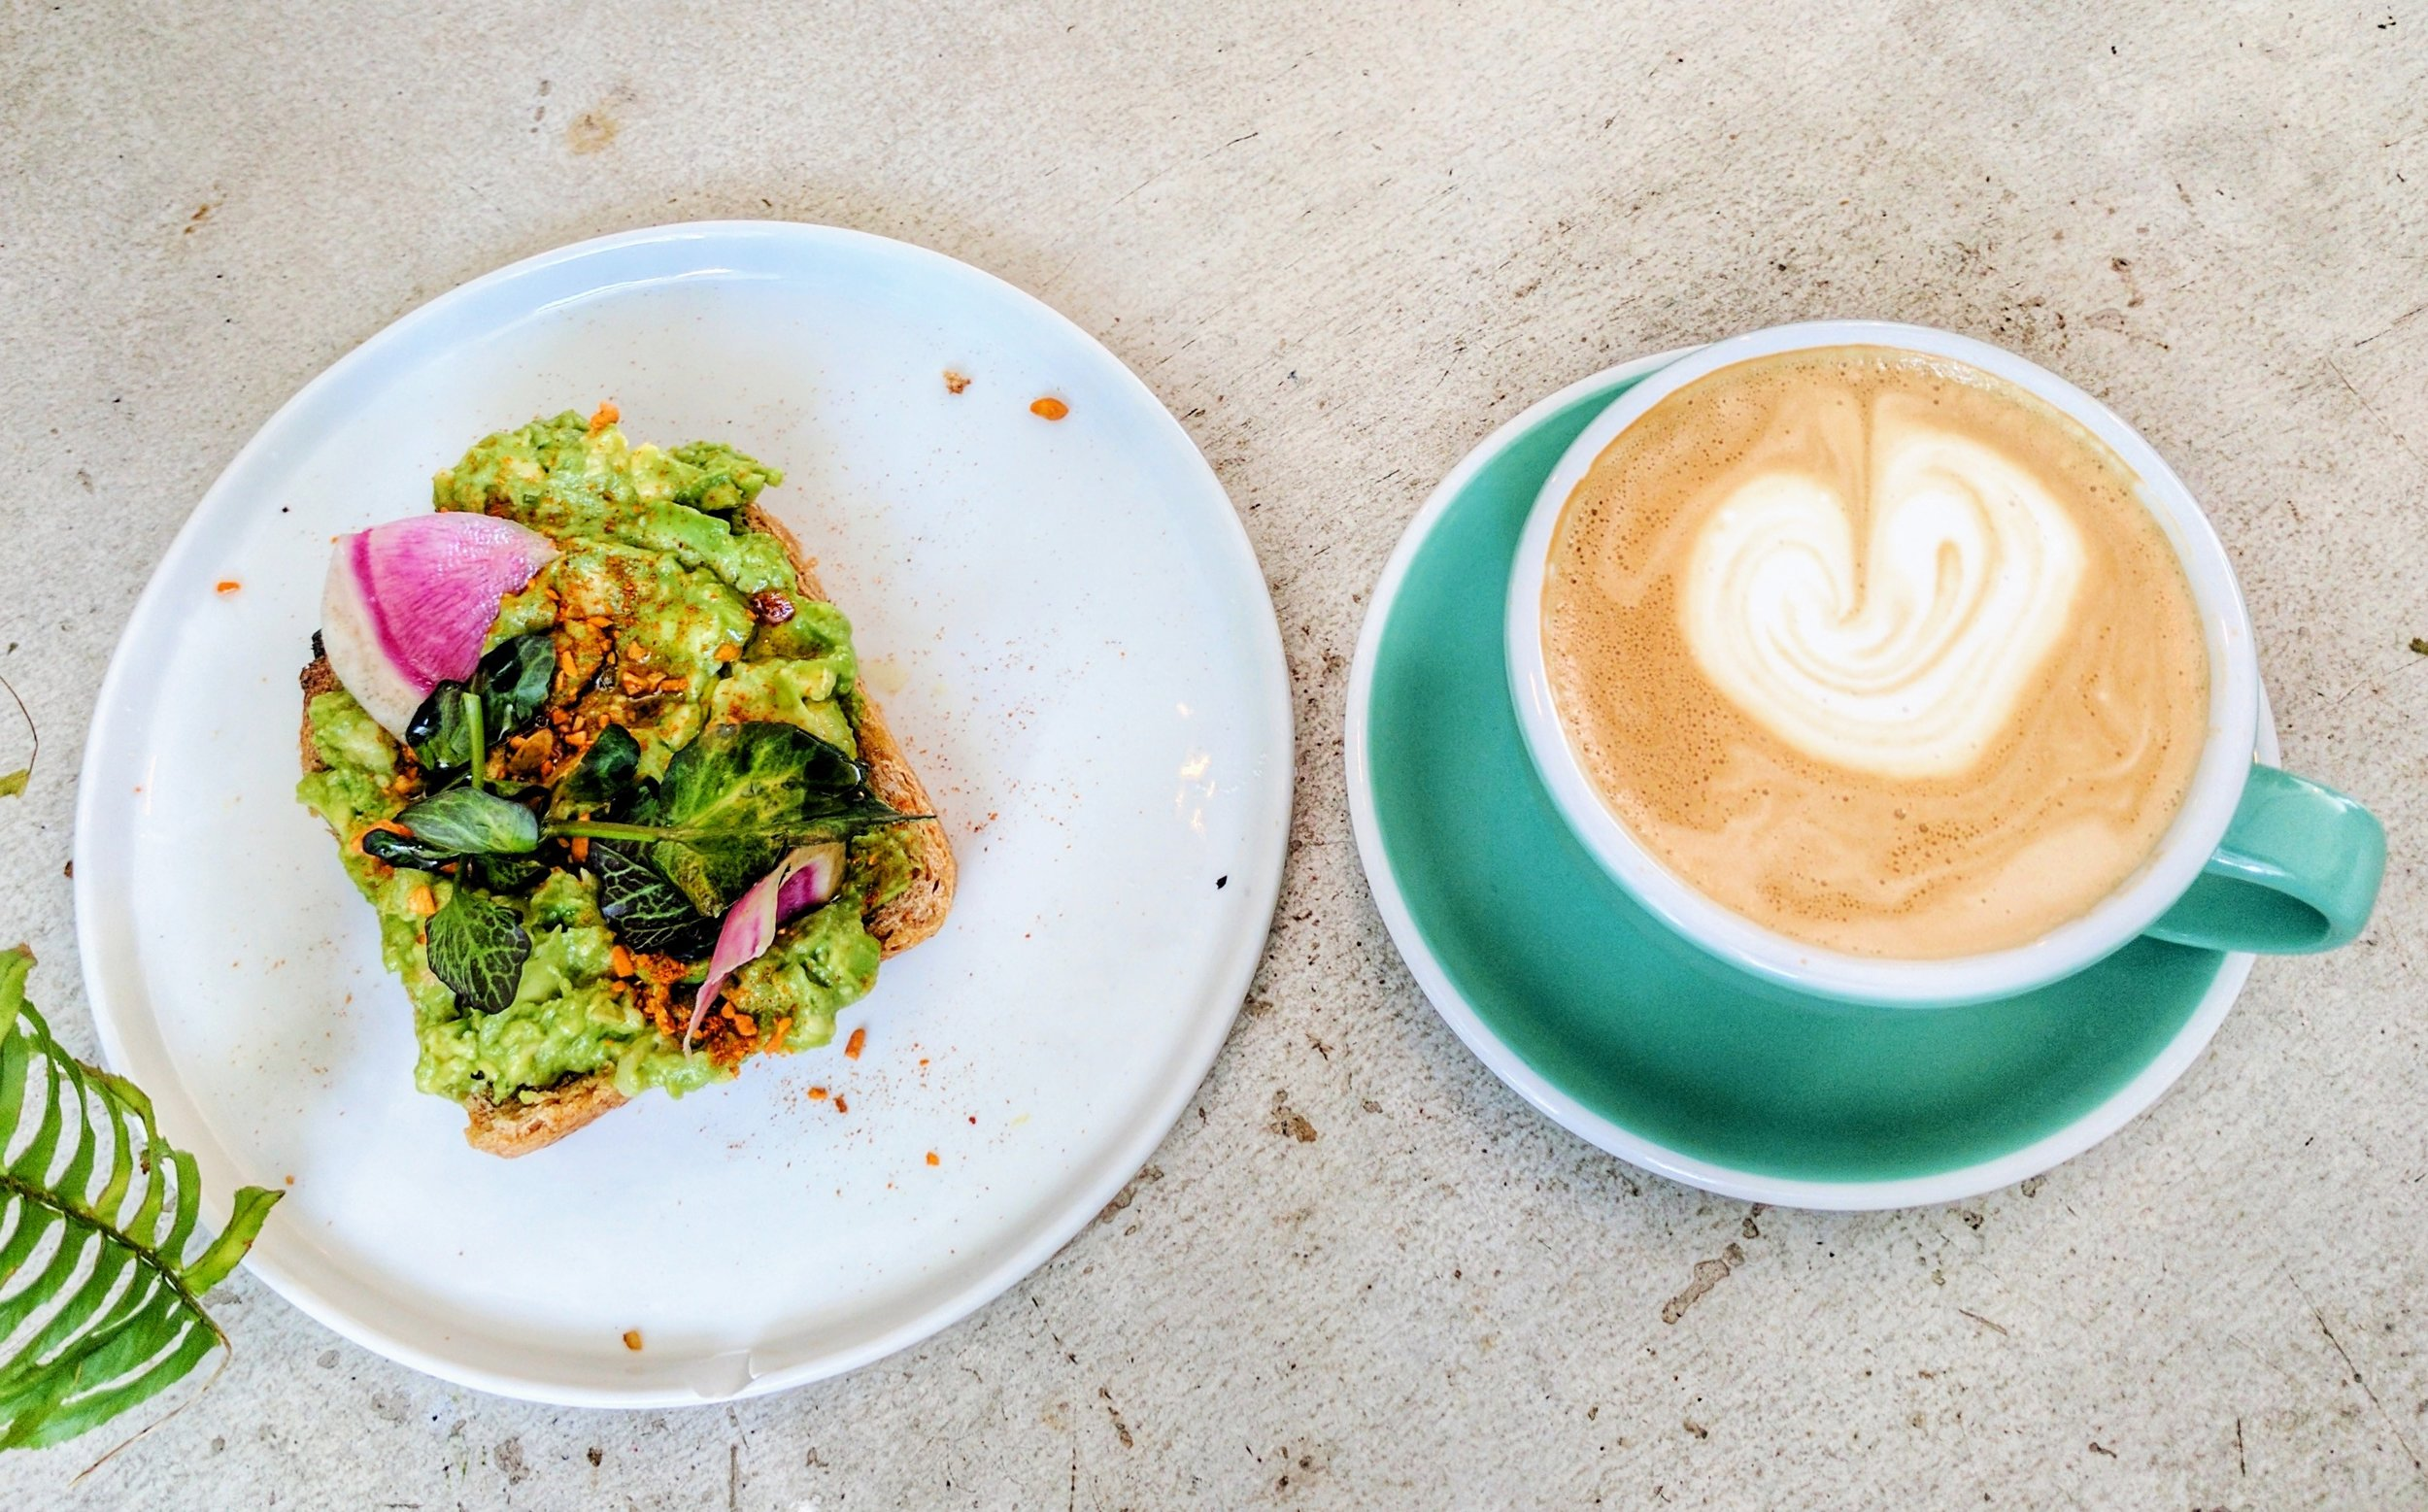 Lavender latte + seasoned avocado toast on multigrain sourdough with pickled shallot, dukkah and lime.